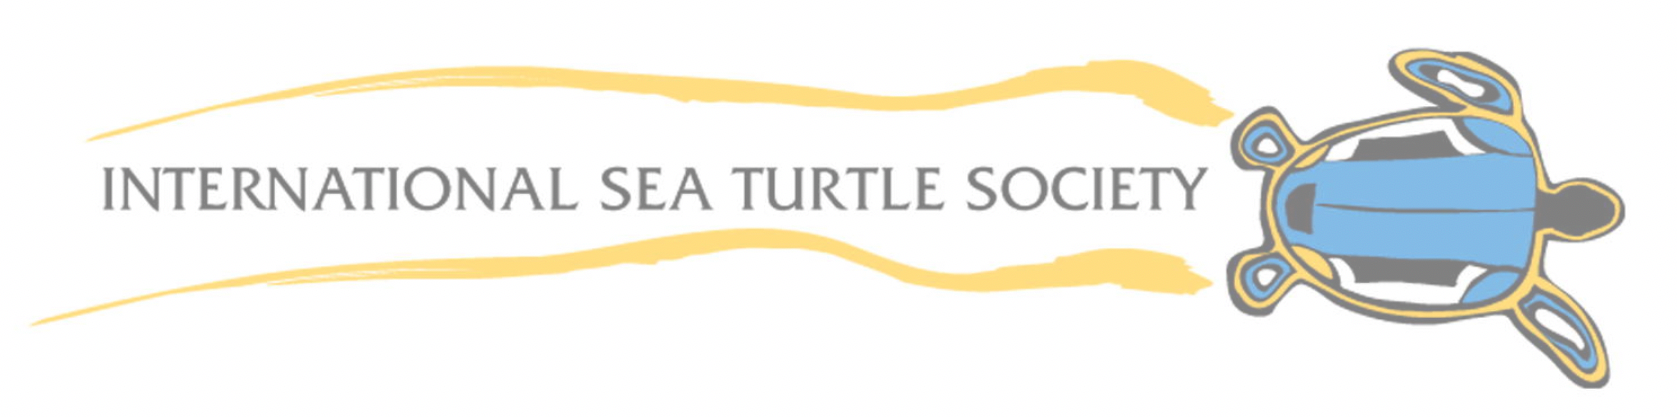 HV_sea_turtle.png